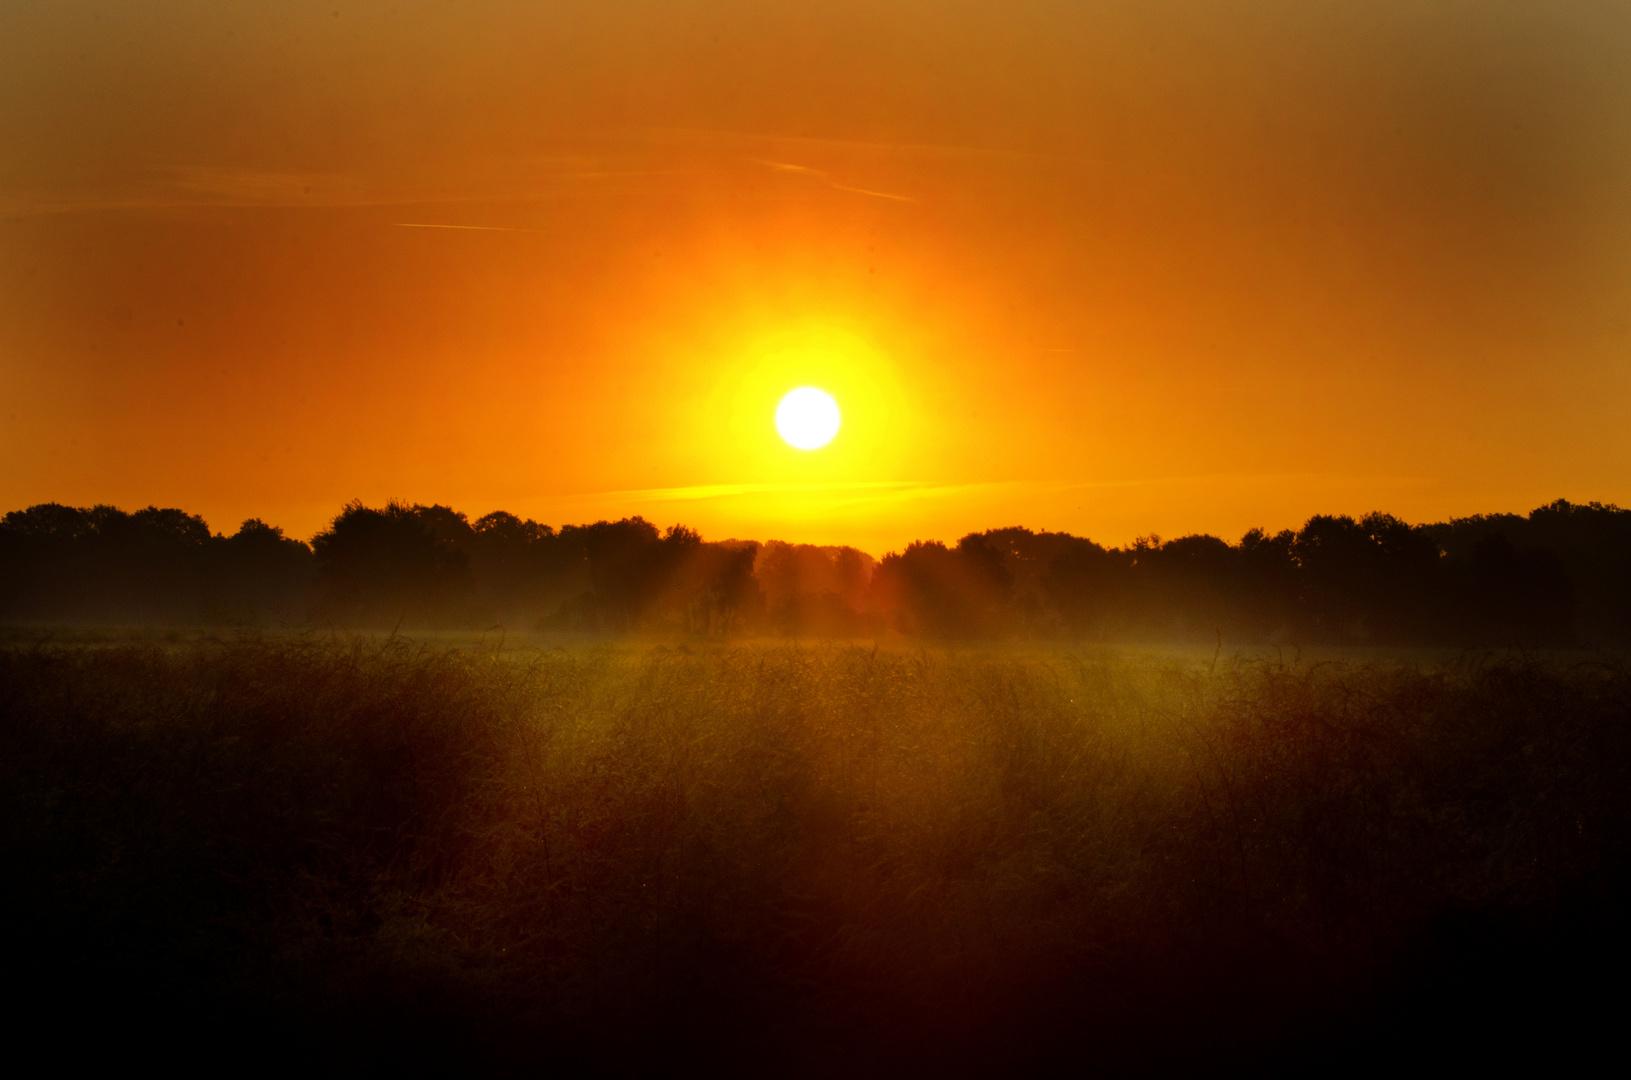 Sonnenaufgang im Kuhlenvenn